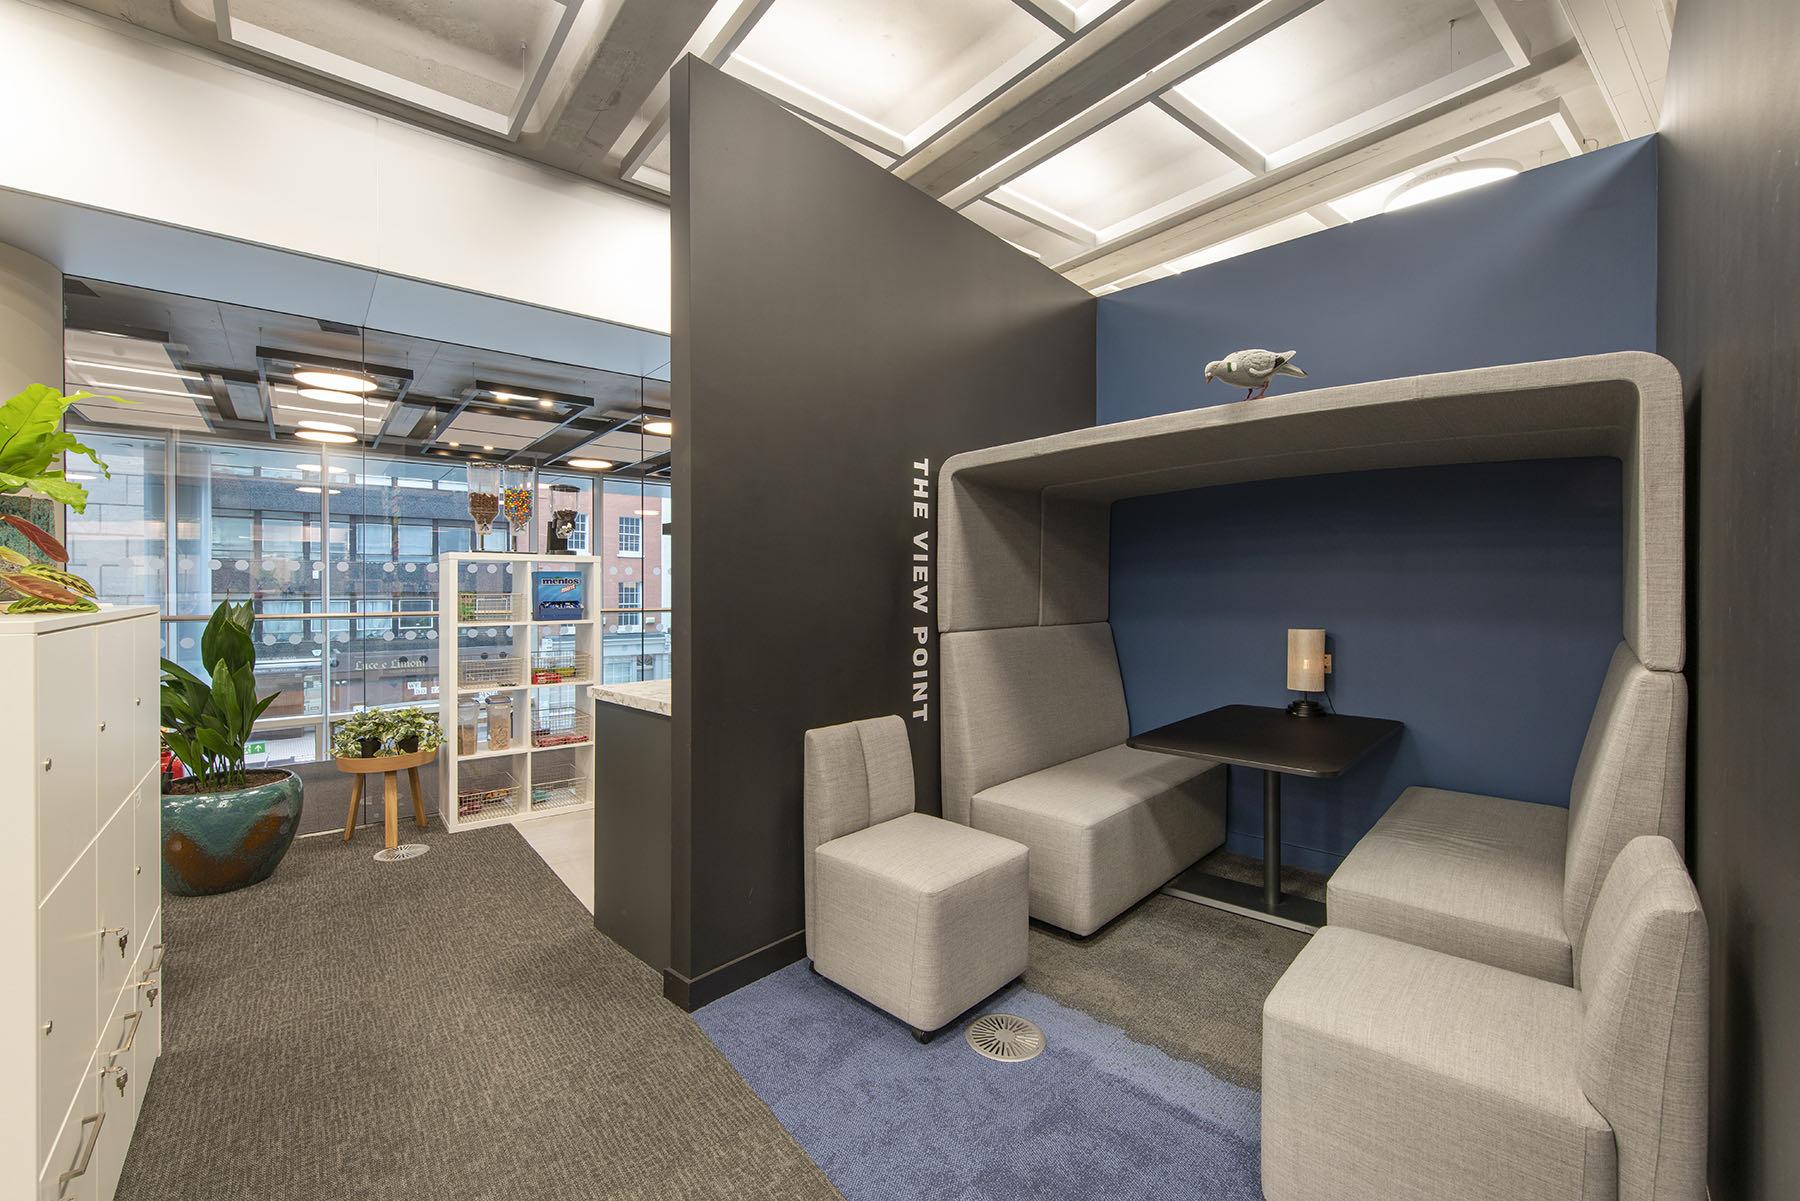 metapack-london-office-8